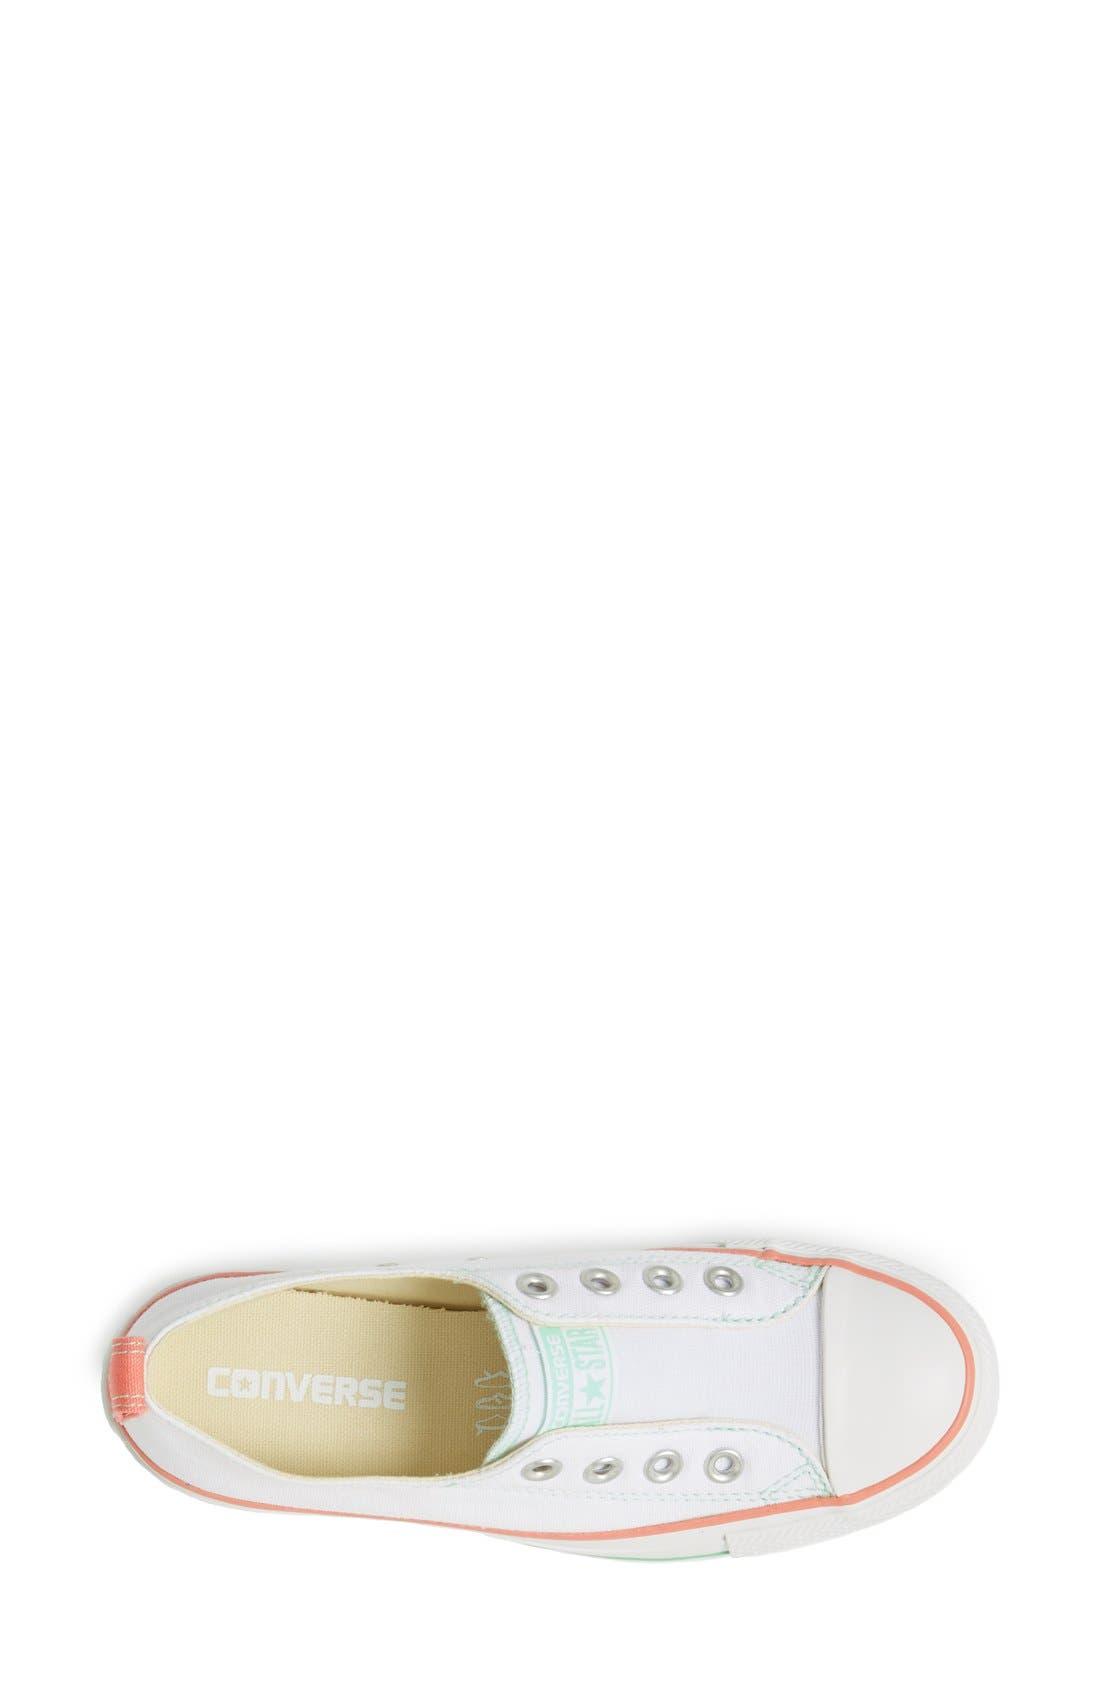 Alternate Image 3  - Converse Chuck Taylor® All Star® Laceless Slip-On Sneaker (Women)